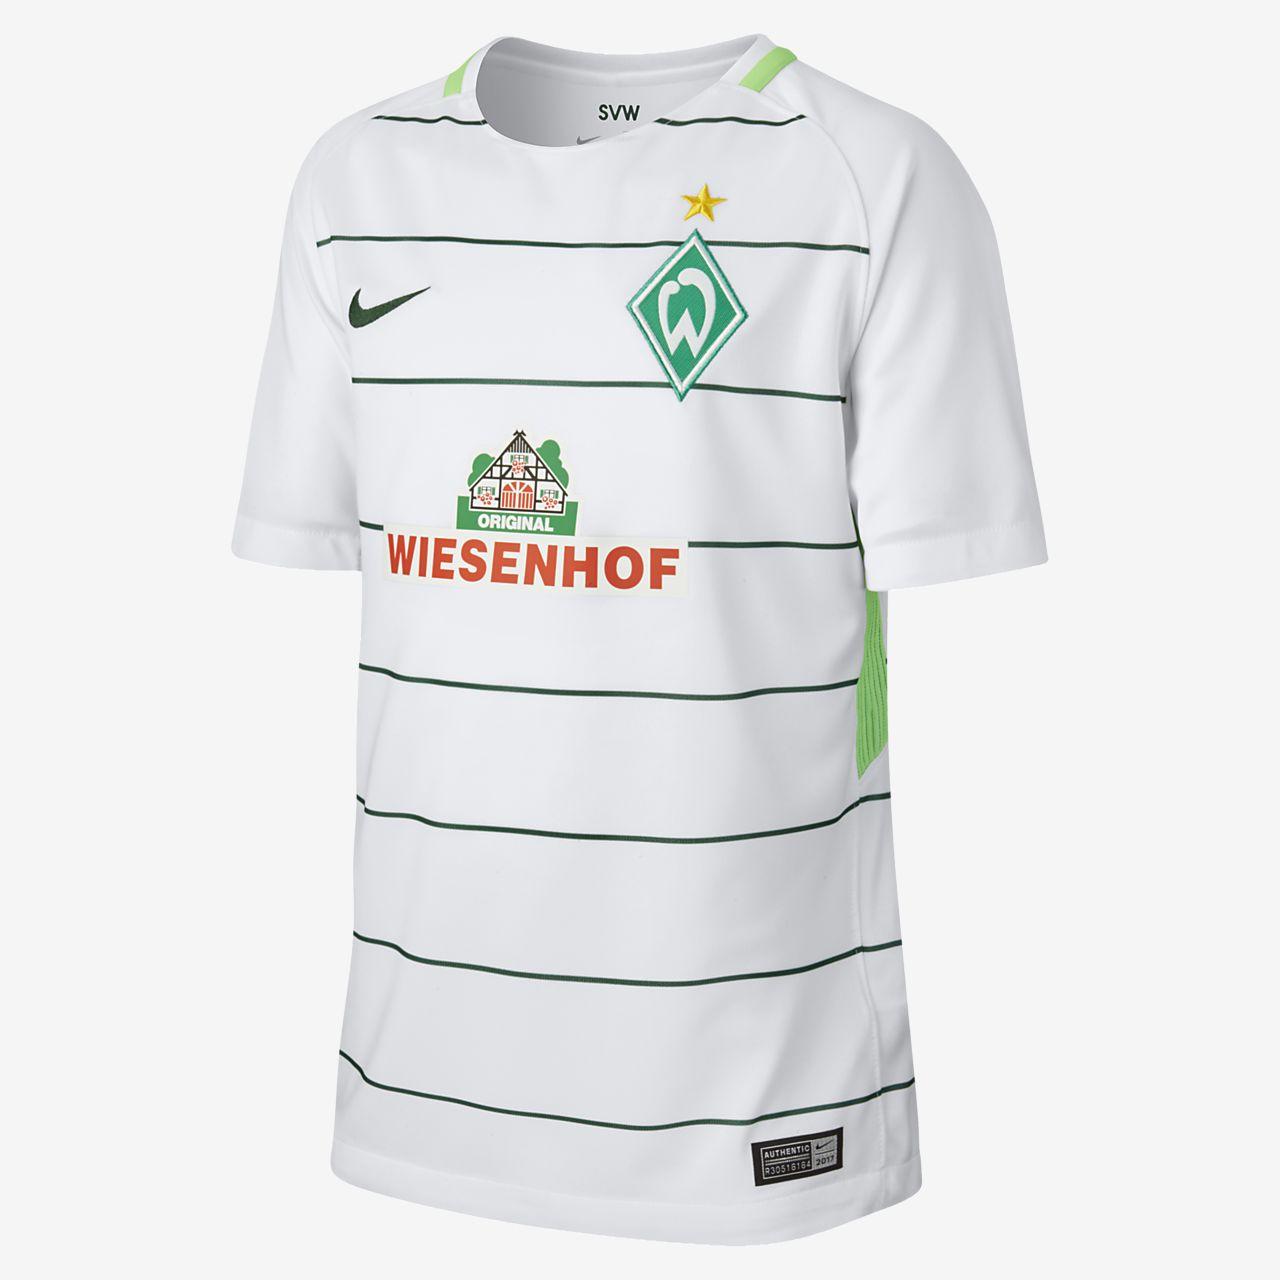 2017/18 Werder Bremen Stadium Away – fodboldtrøje til store børn